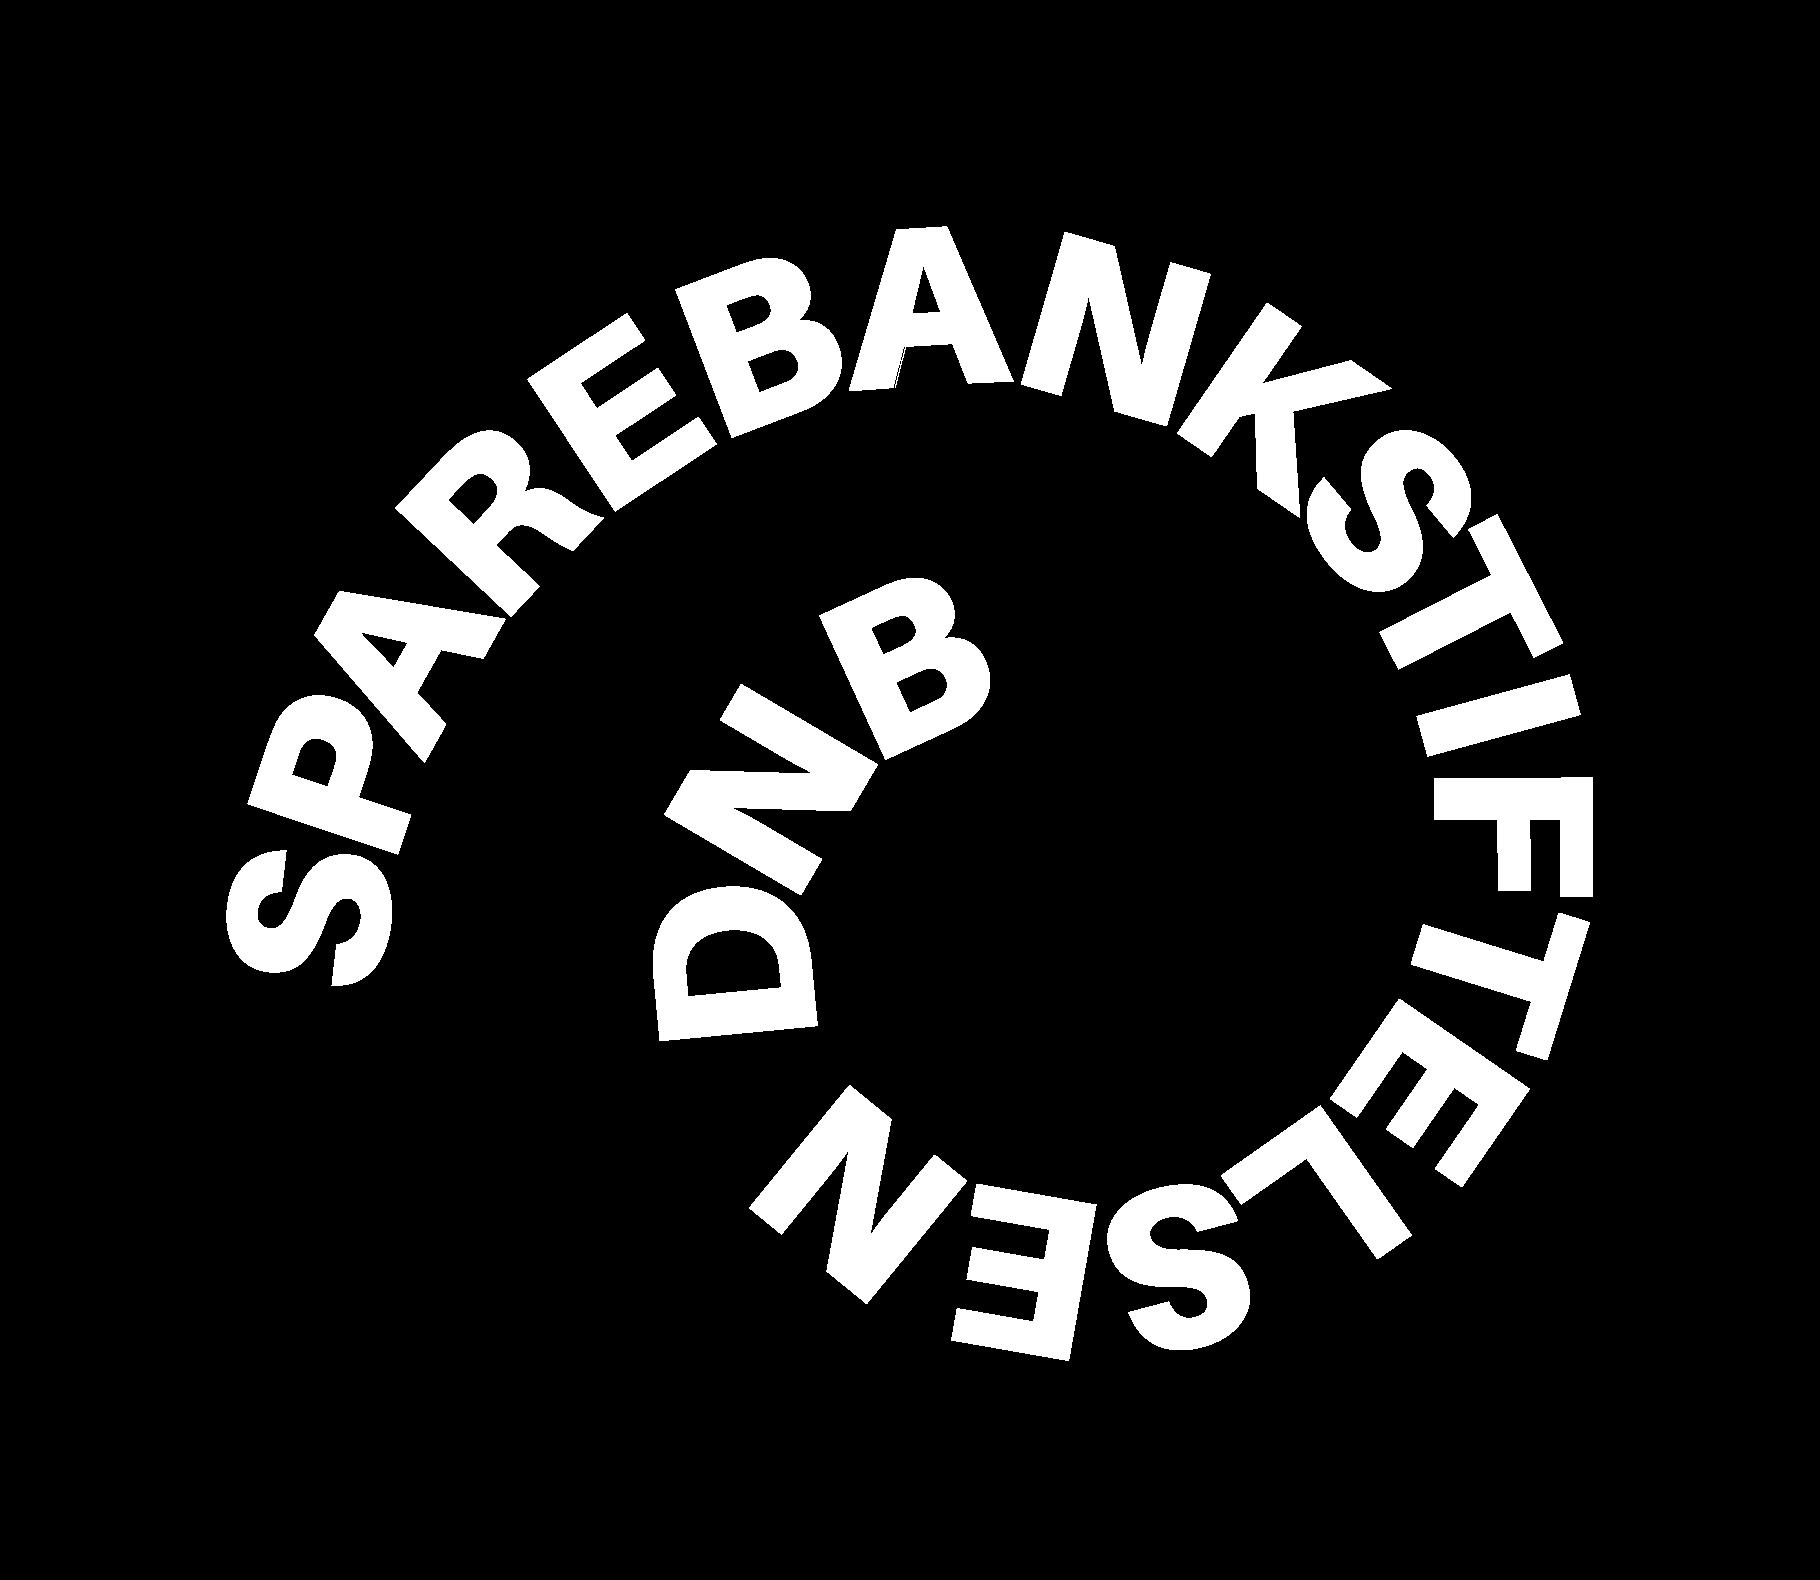 Sparebankstiftelsen logo